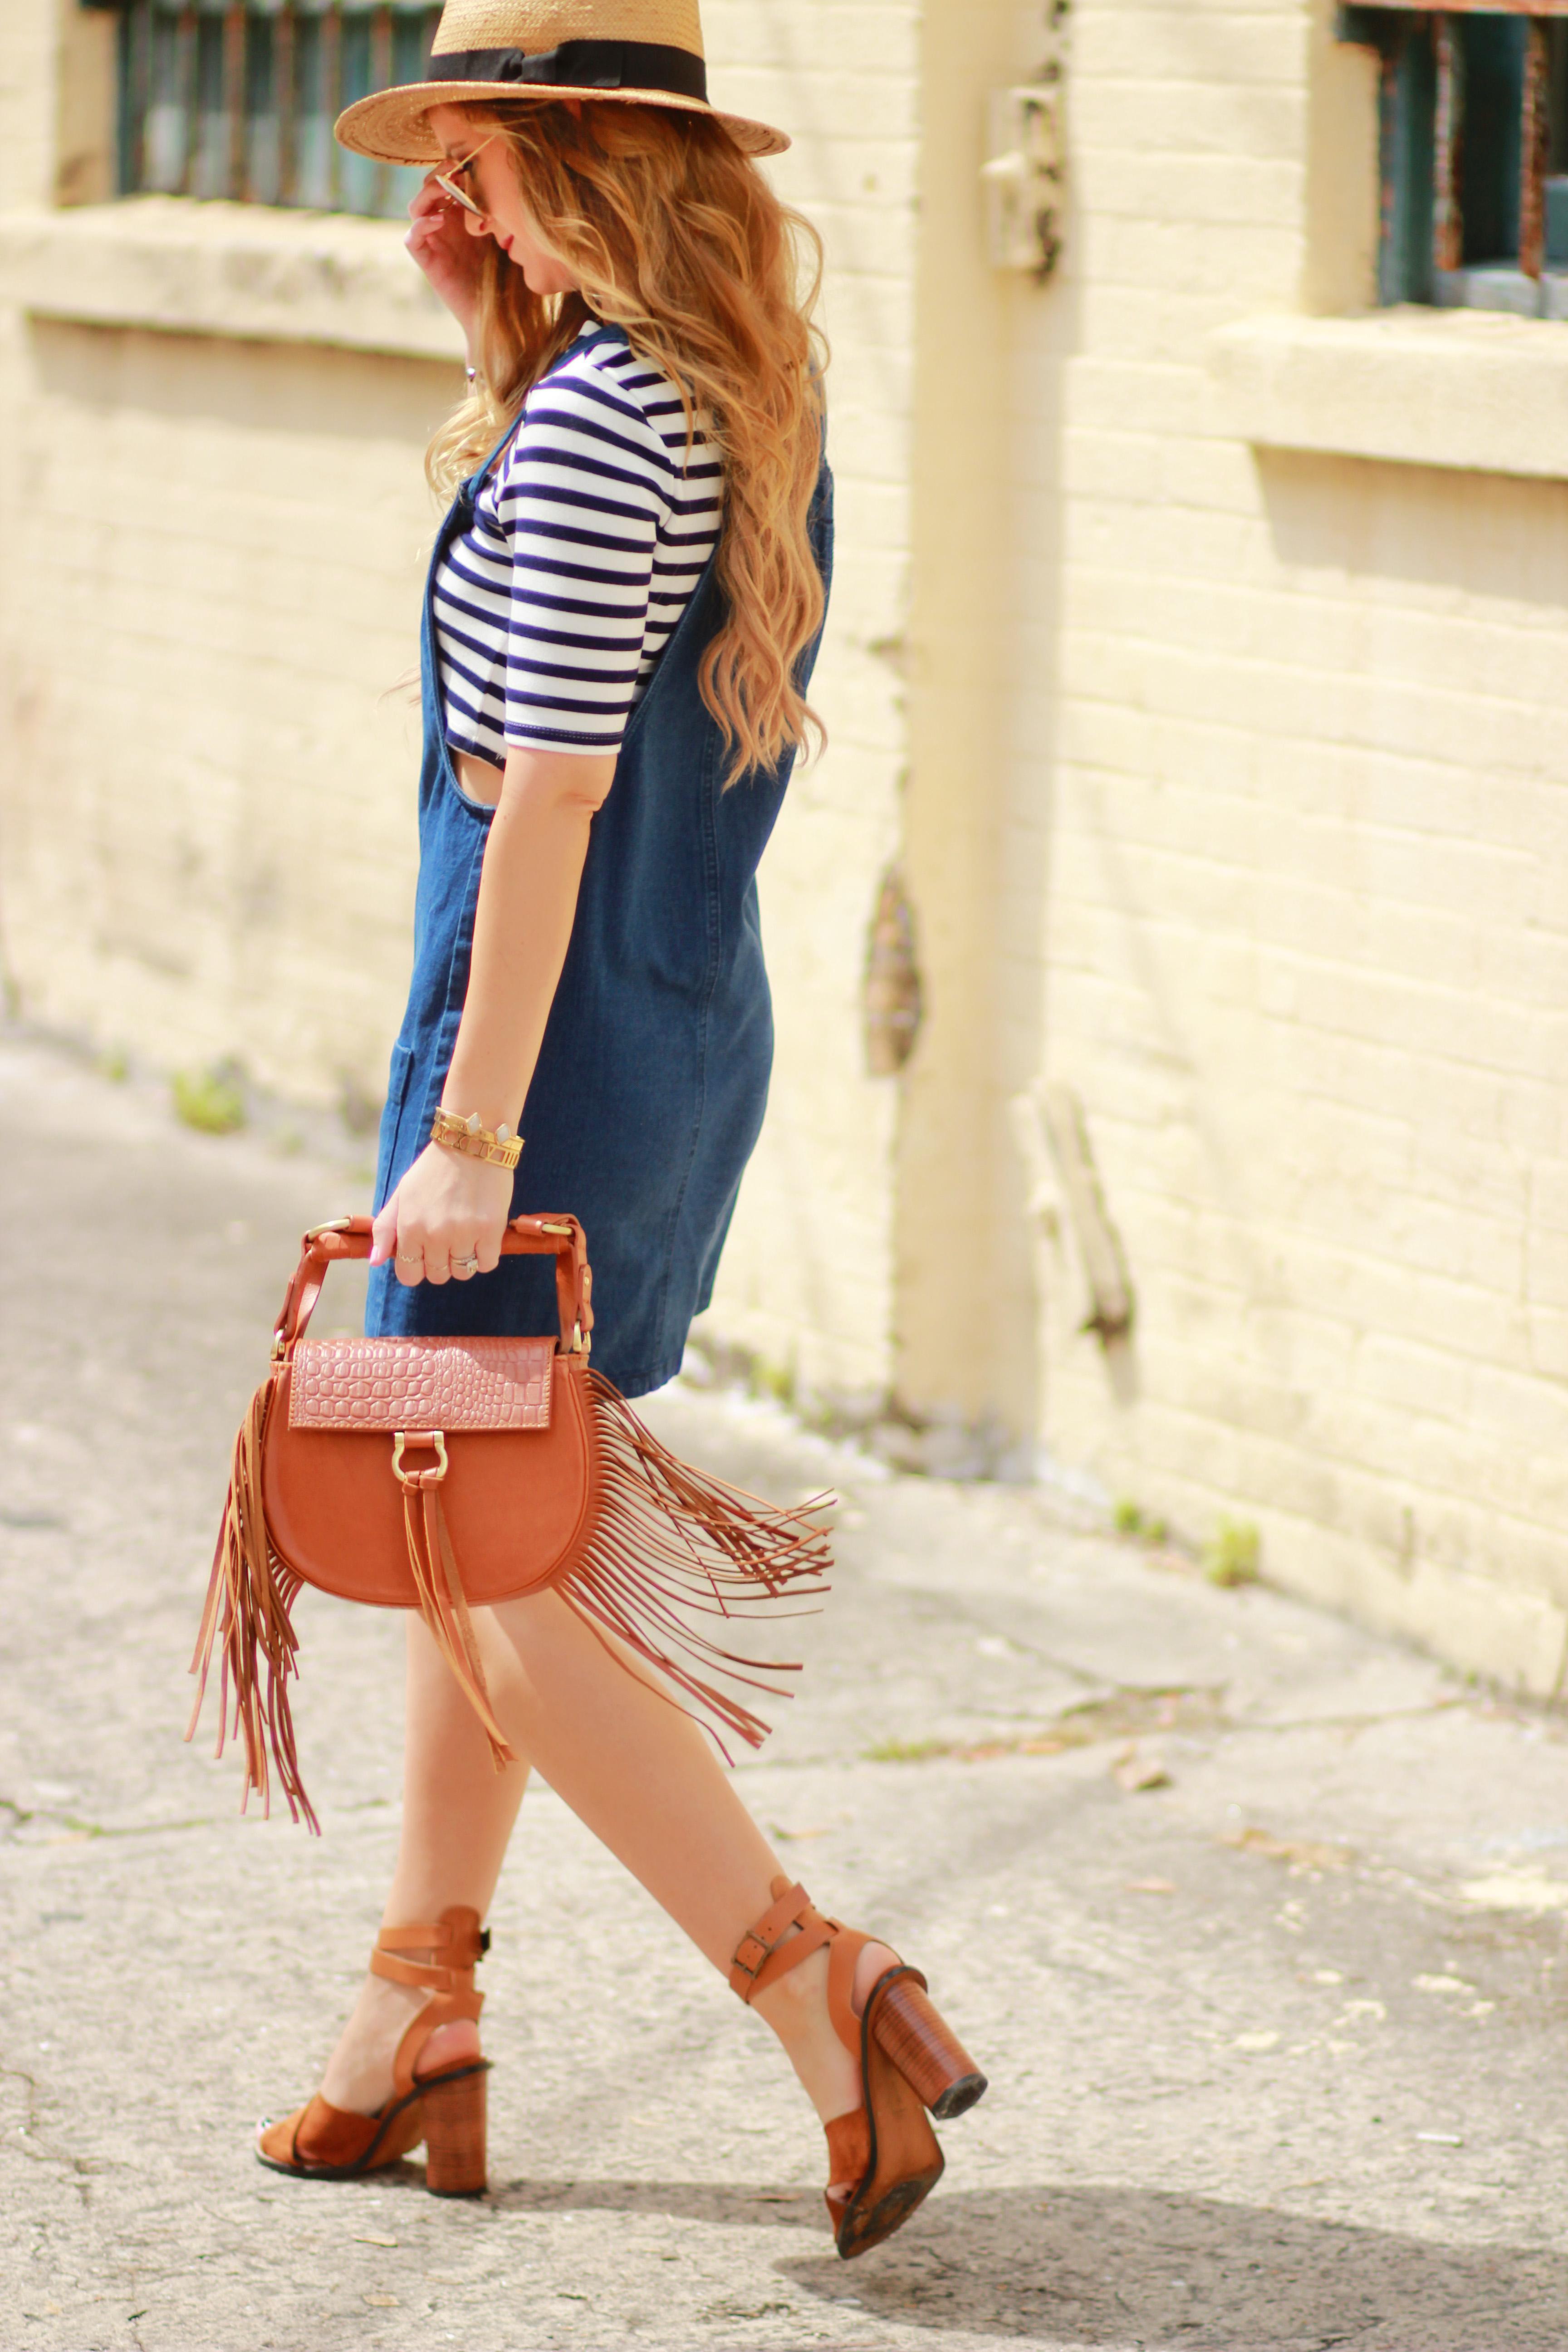 Denim u0026 Stripe Outfit | Upbeat Soles | Orlando Florida ...